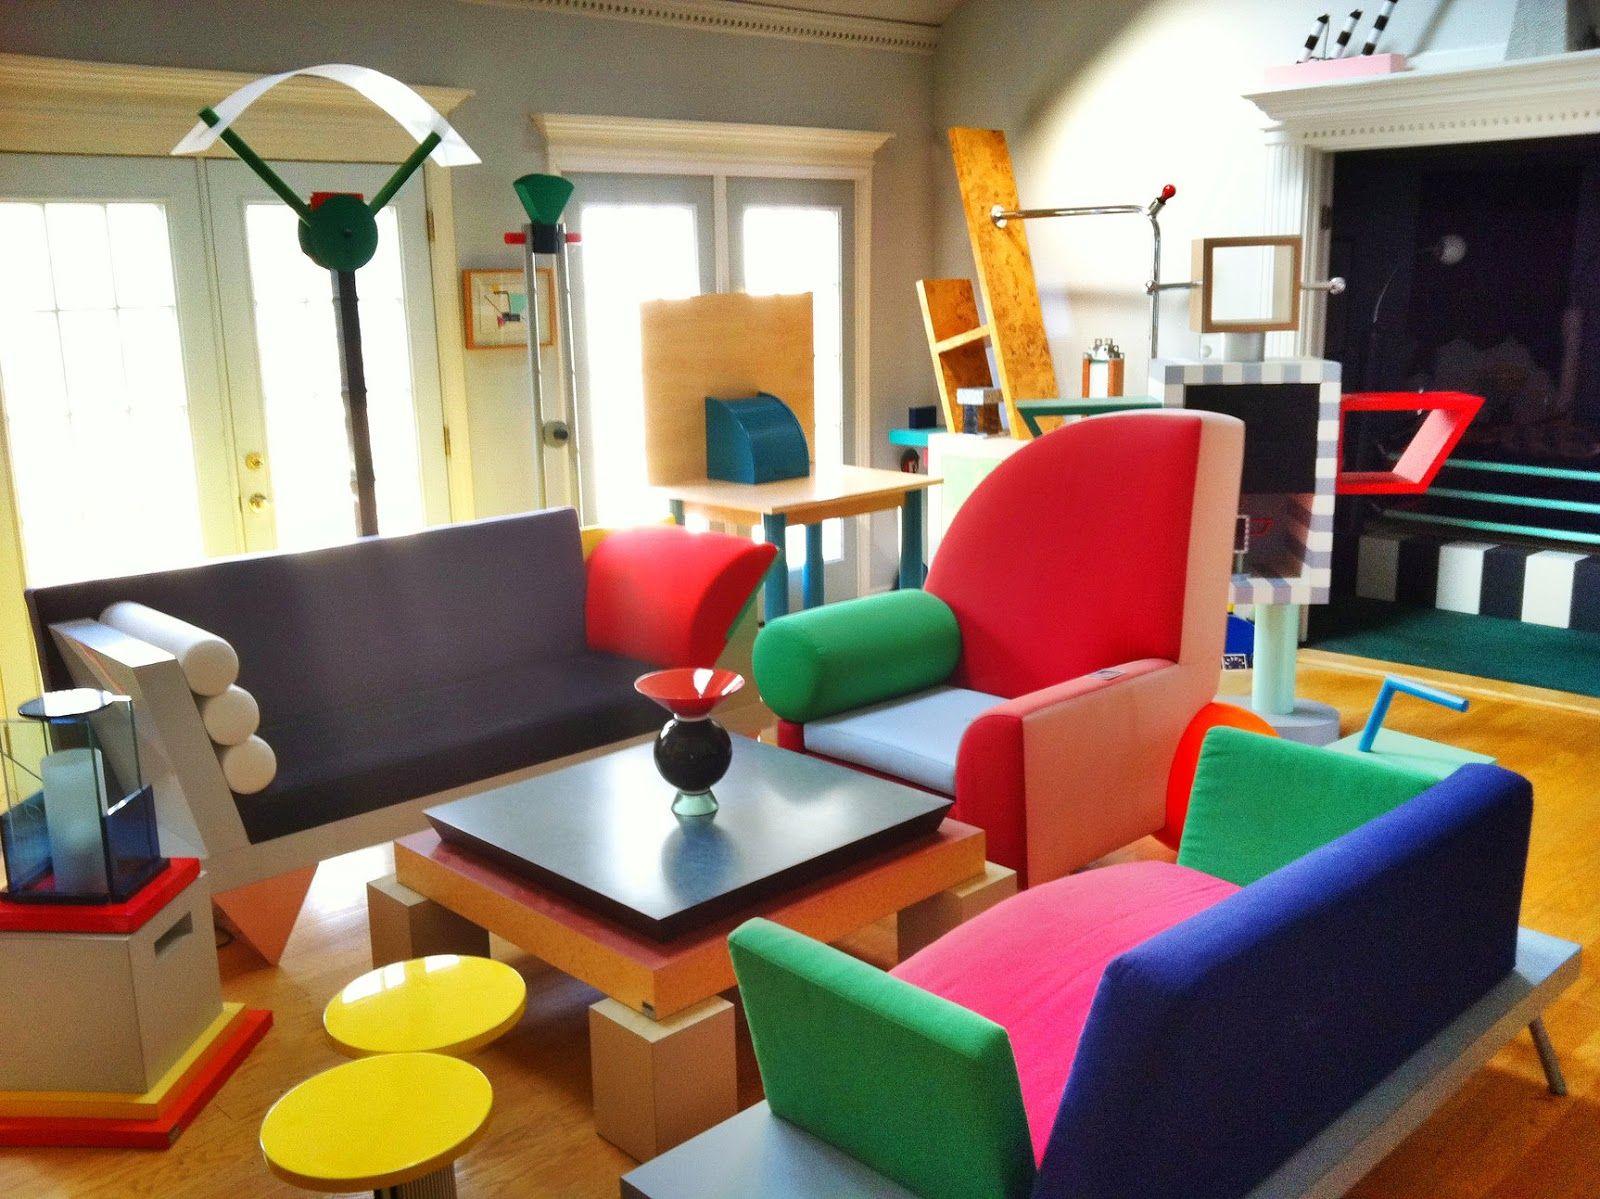 memphis design furniture. The Well-Appointed Catwalk: \u0027Memphis-Milano: 1980s Italian Design\u0027 Opens Memphis Design Furniture B